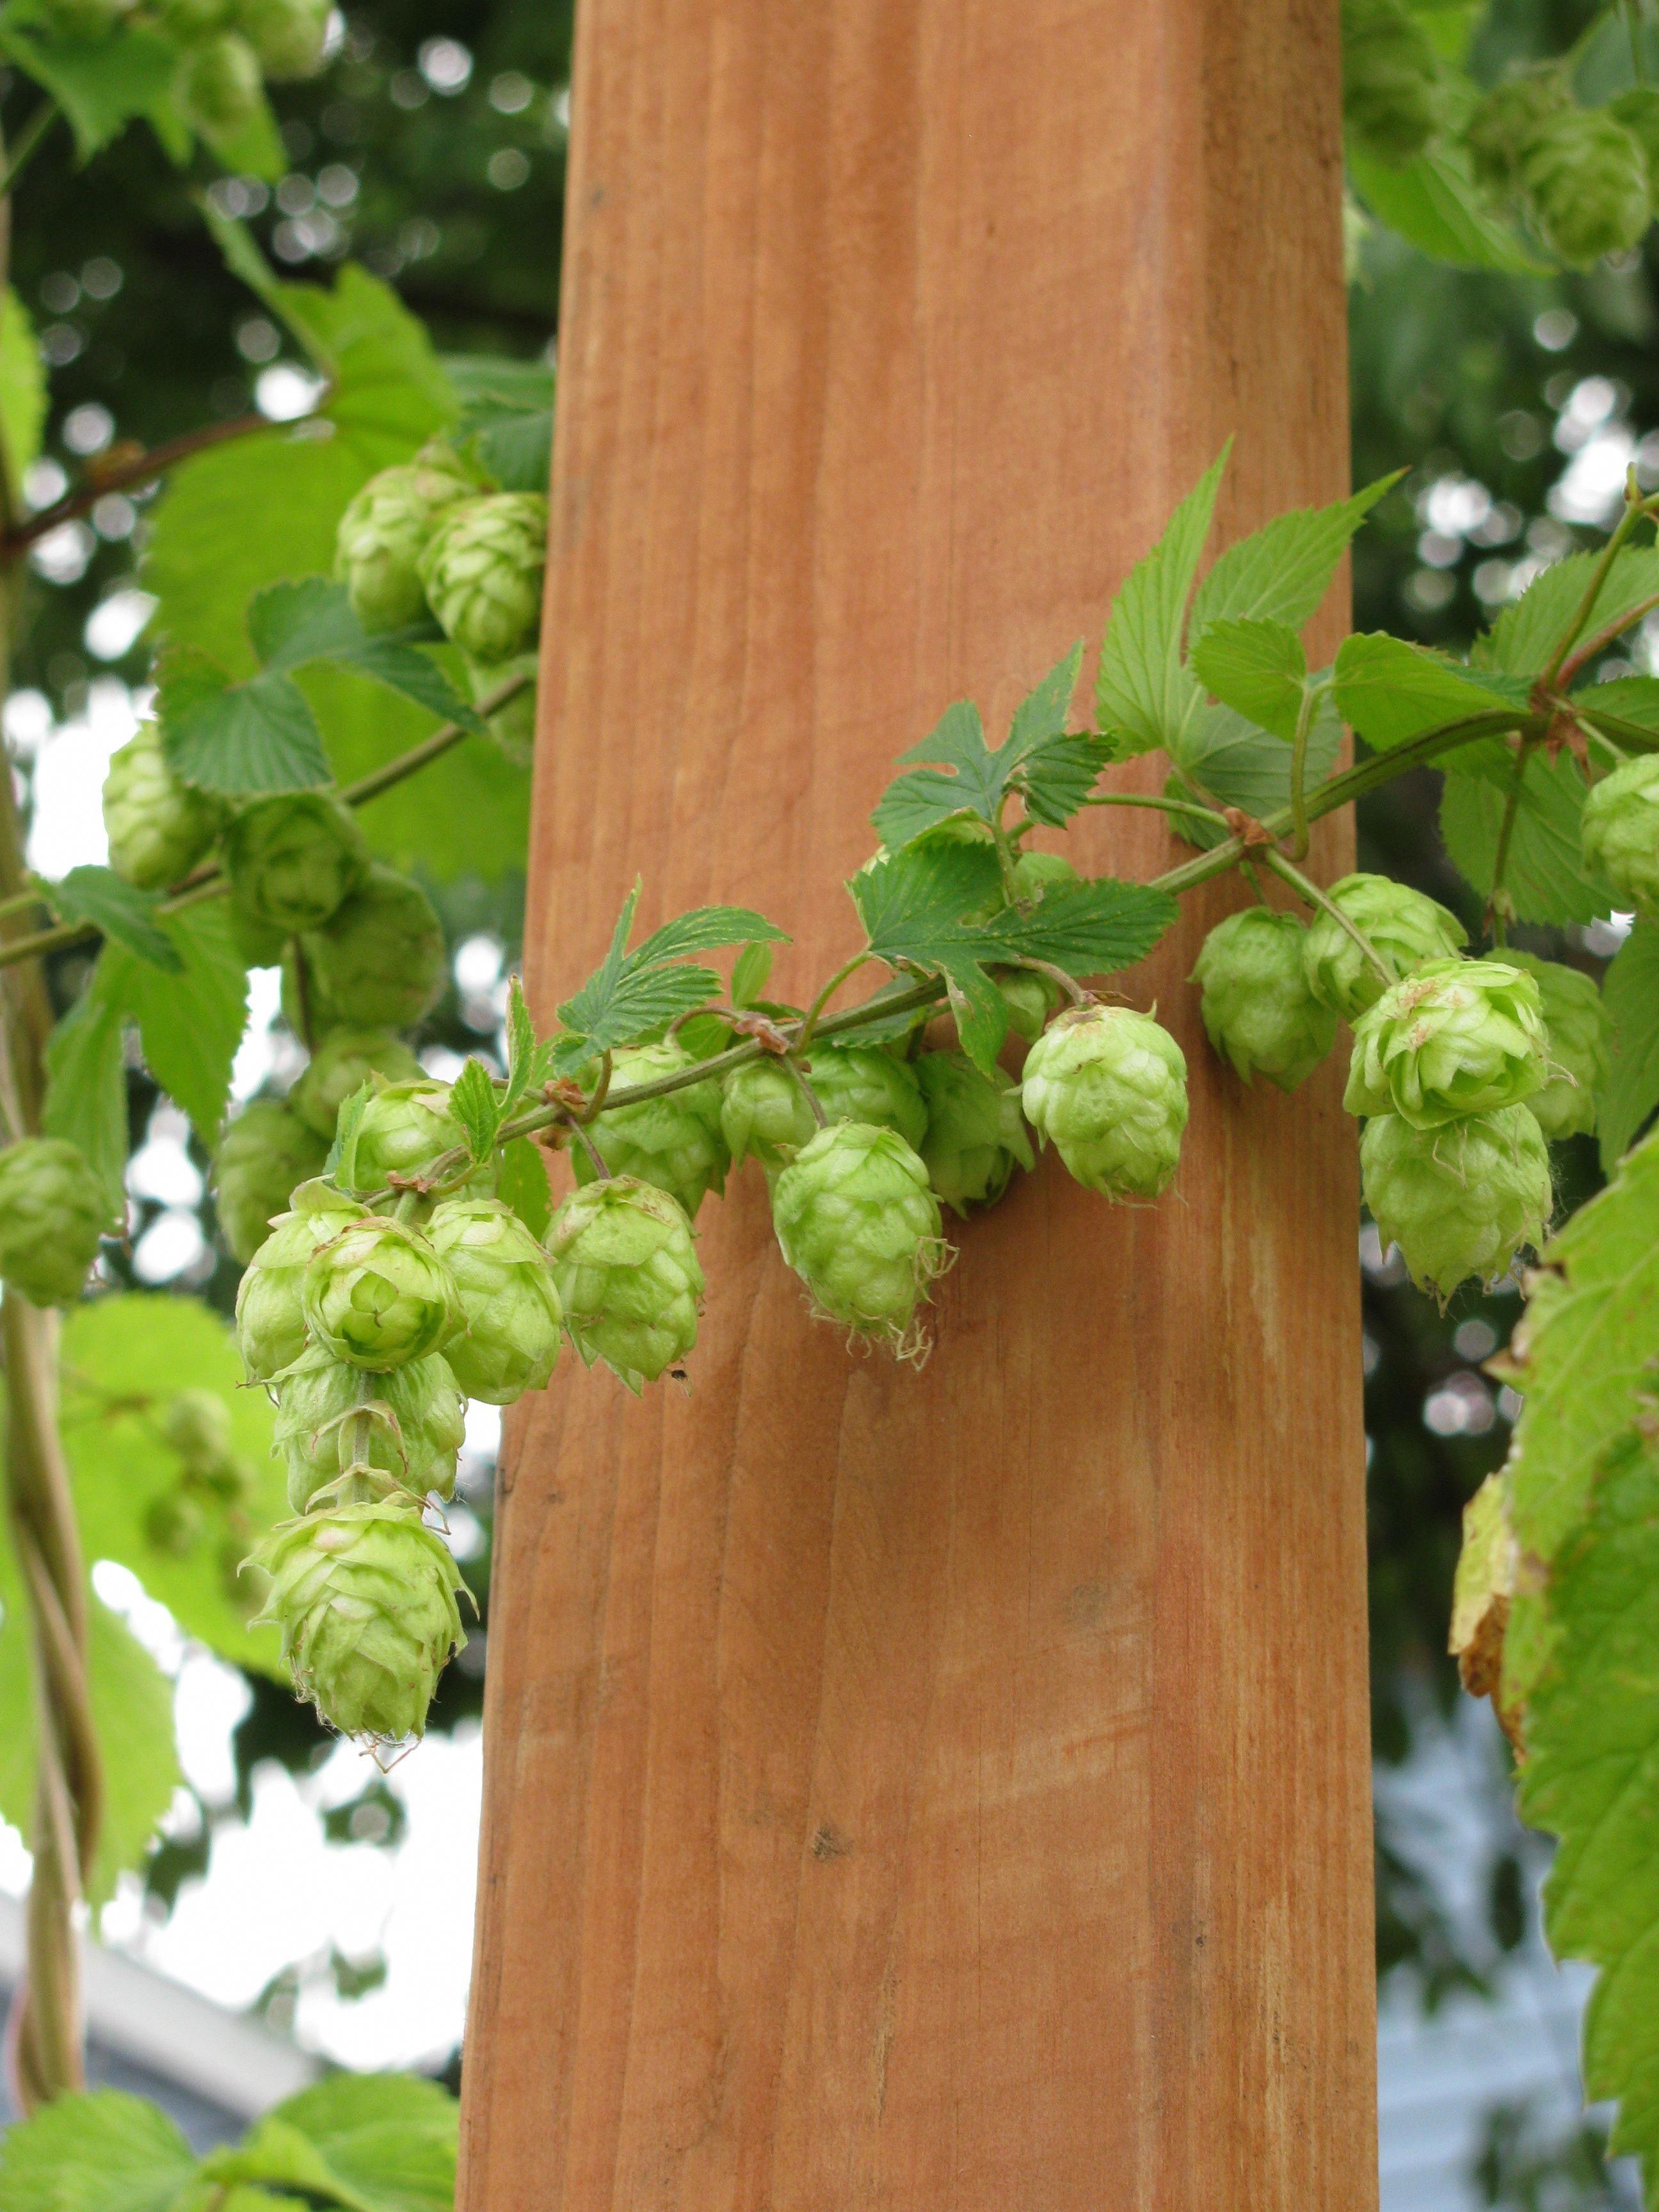 Growing hops to make your own beer homebrewingbeer hops